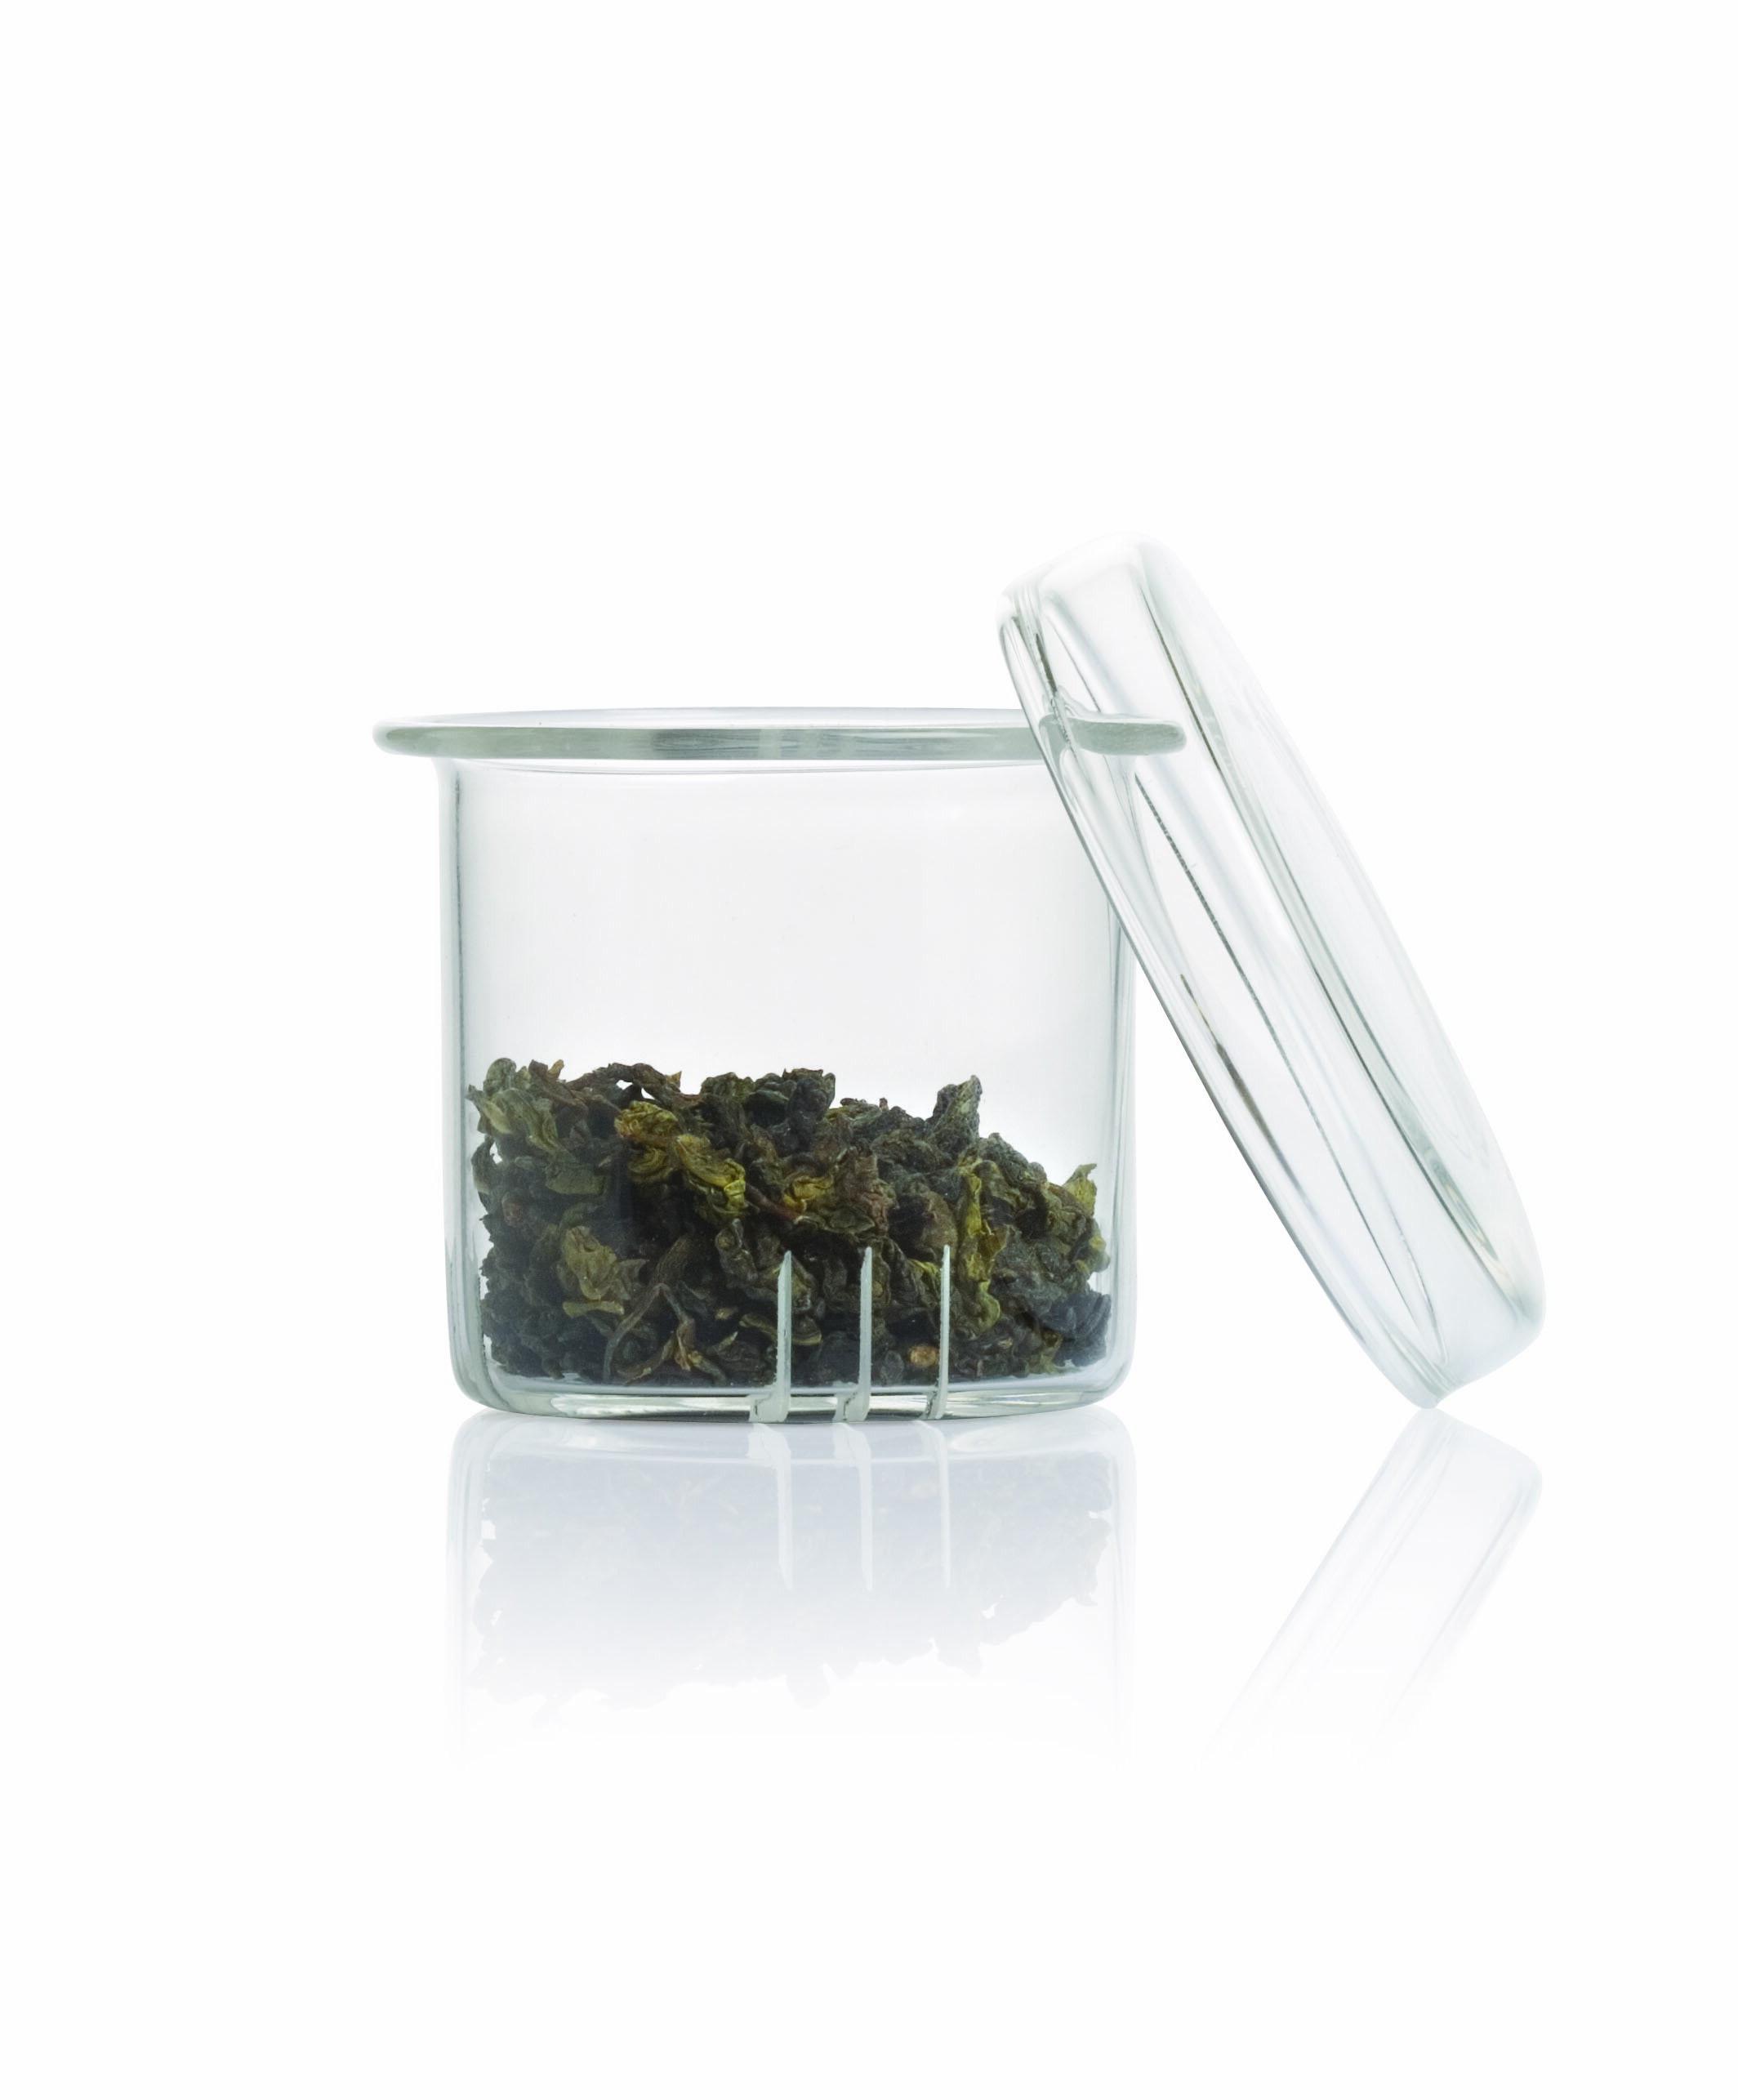 Tea Forte SONTU玻璃茶葉濾杯 SONTU GLASS INFUSER 0